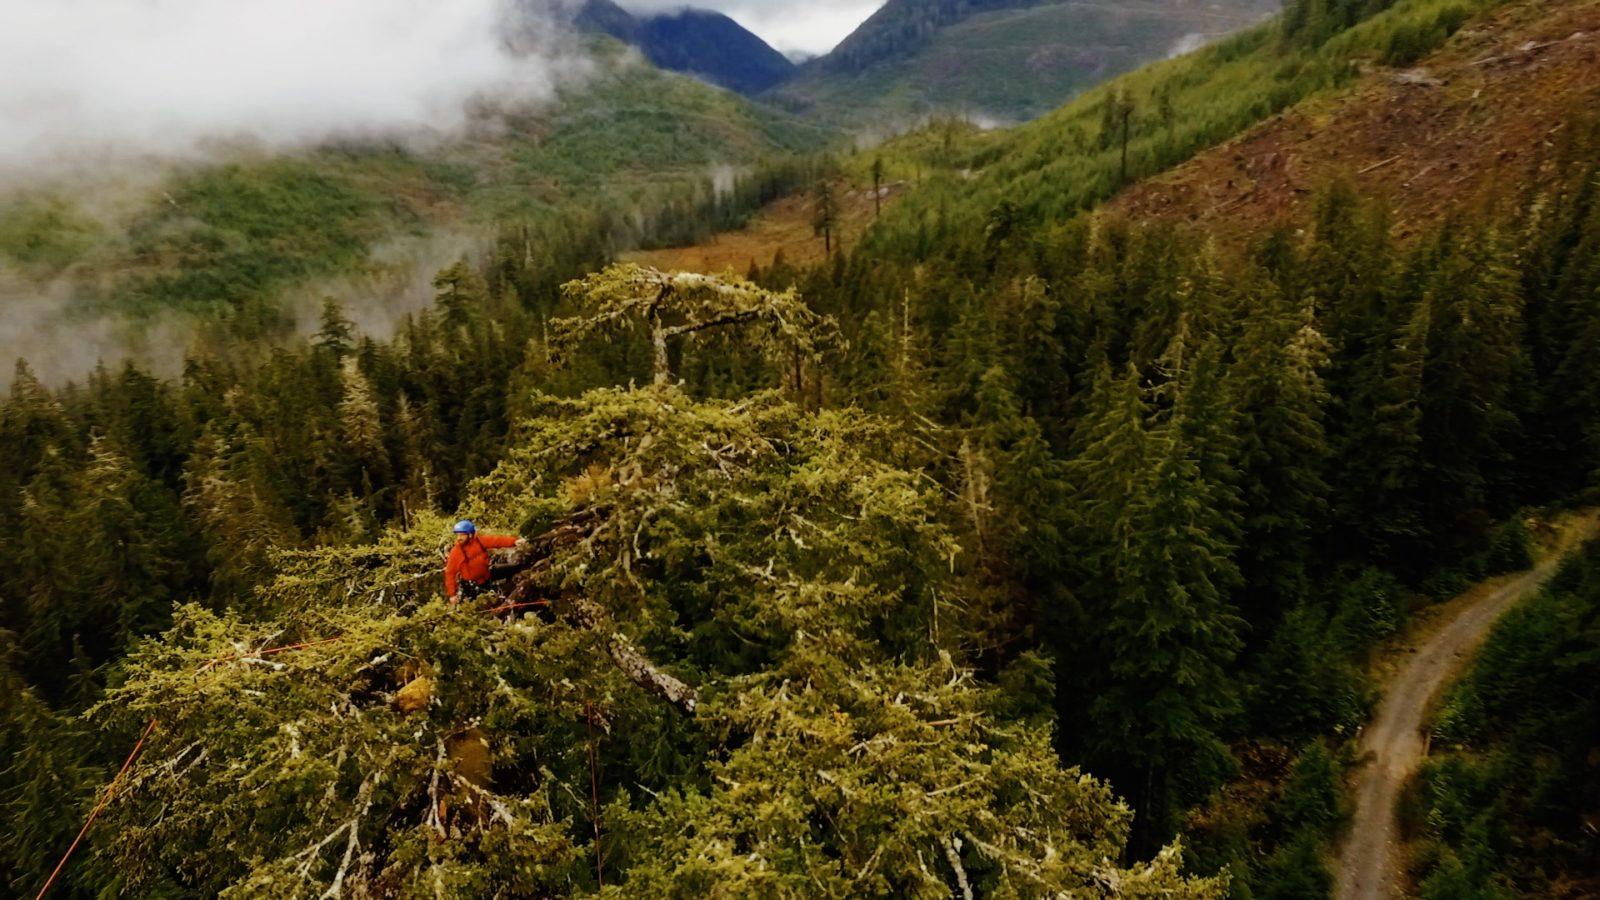 #WorthFightingFor: environmental short films Hunting Giants and Water Warriors